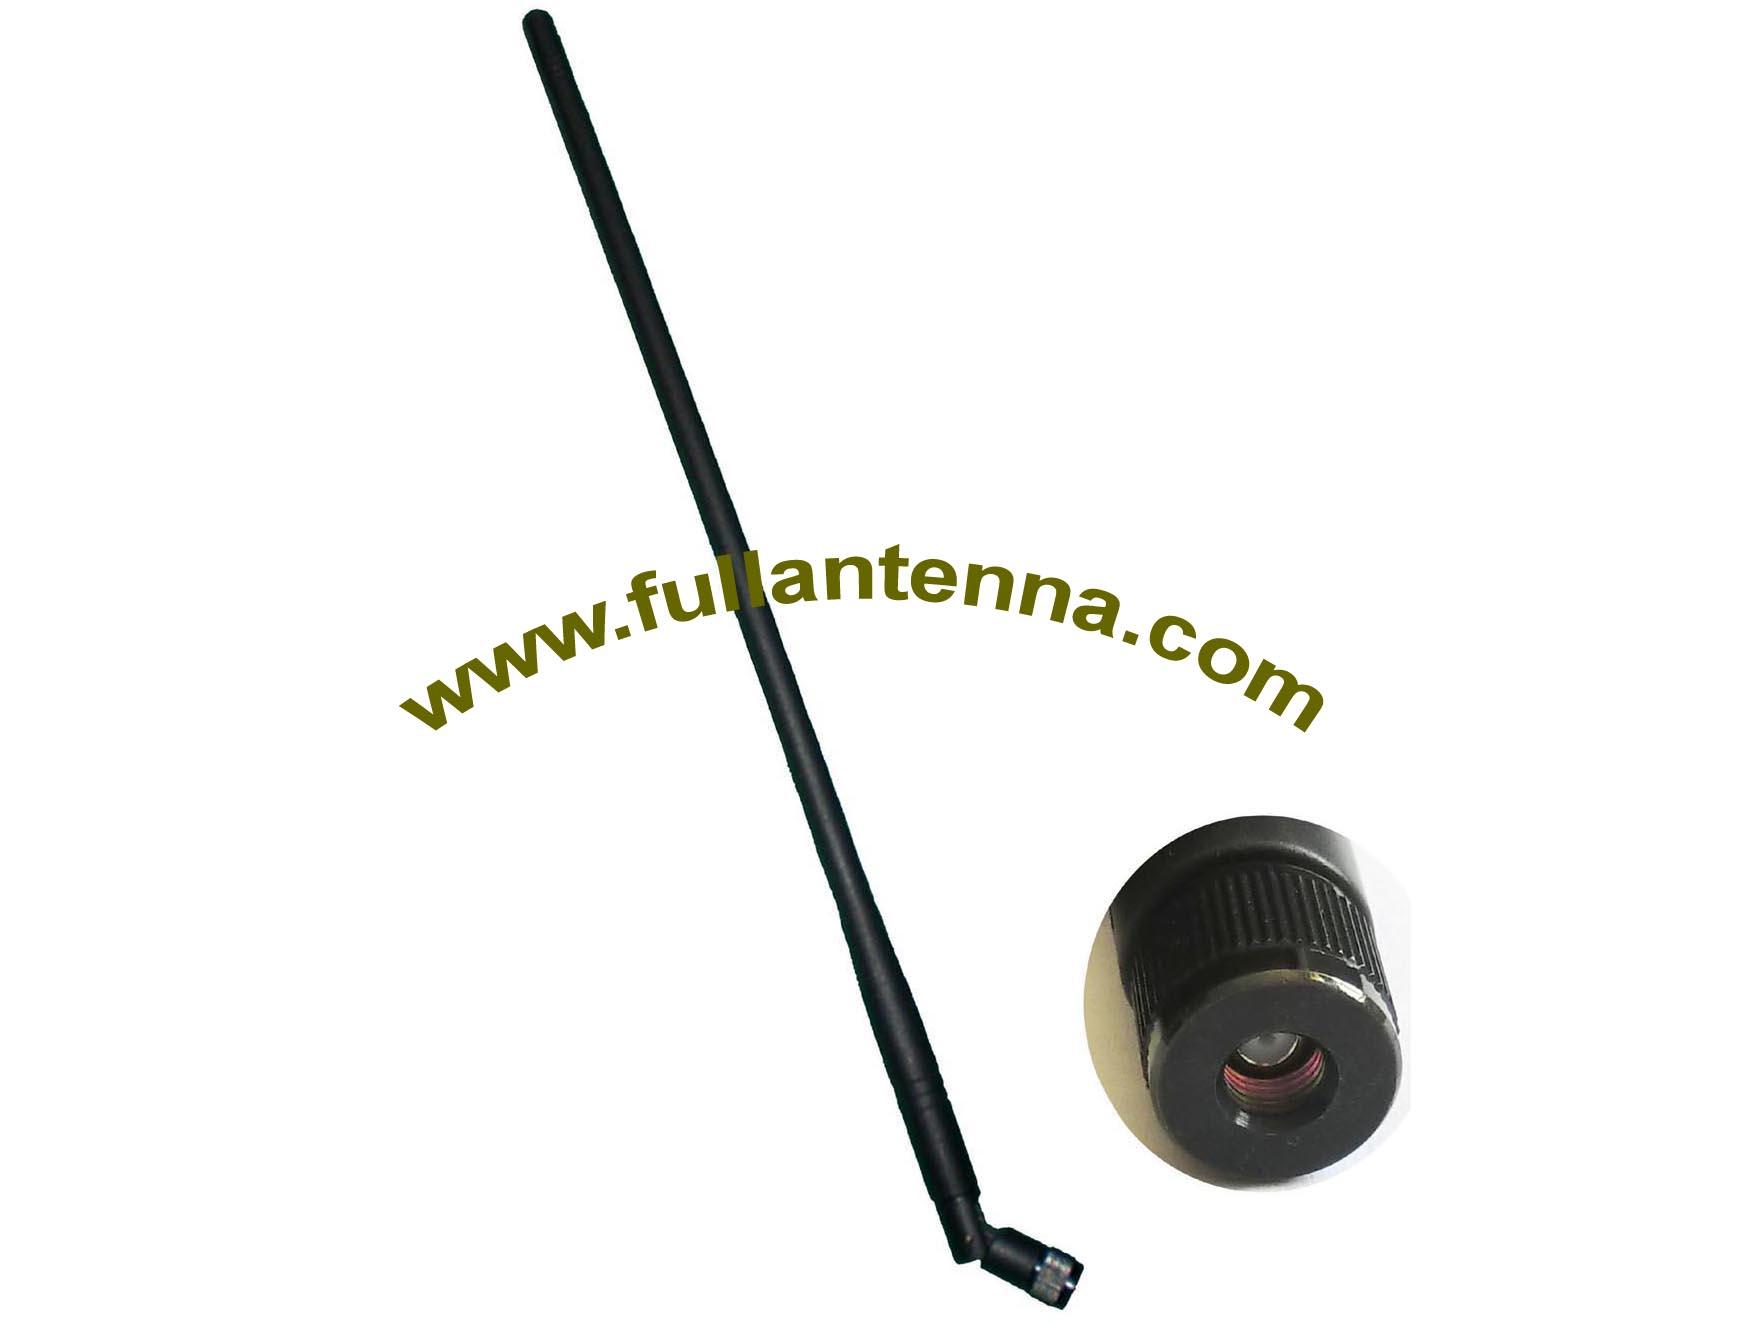 P/N:FA2400.0512,WiFi/2.4G Rubber Antenna,12DBI high gain strong signal for wifi device